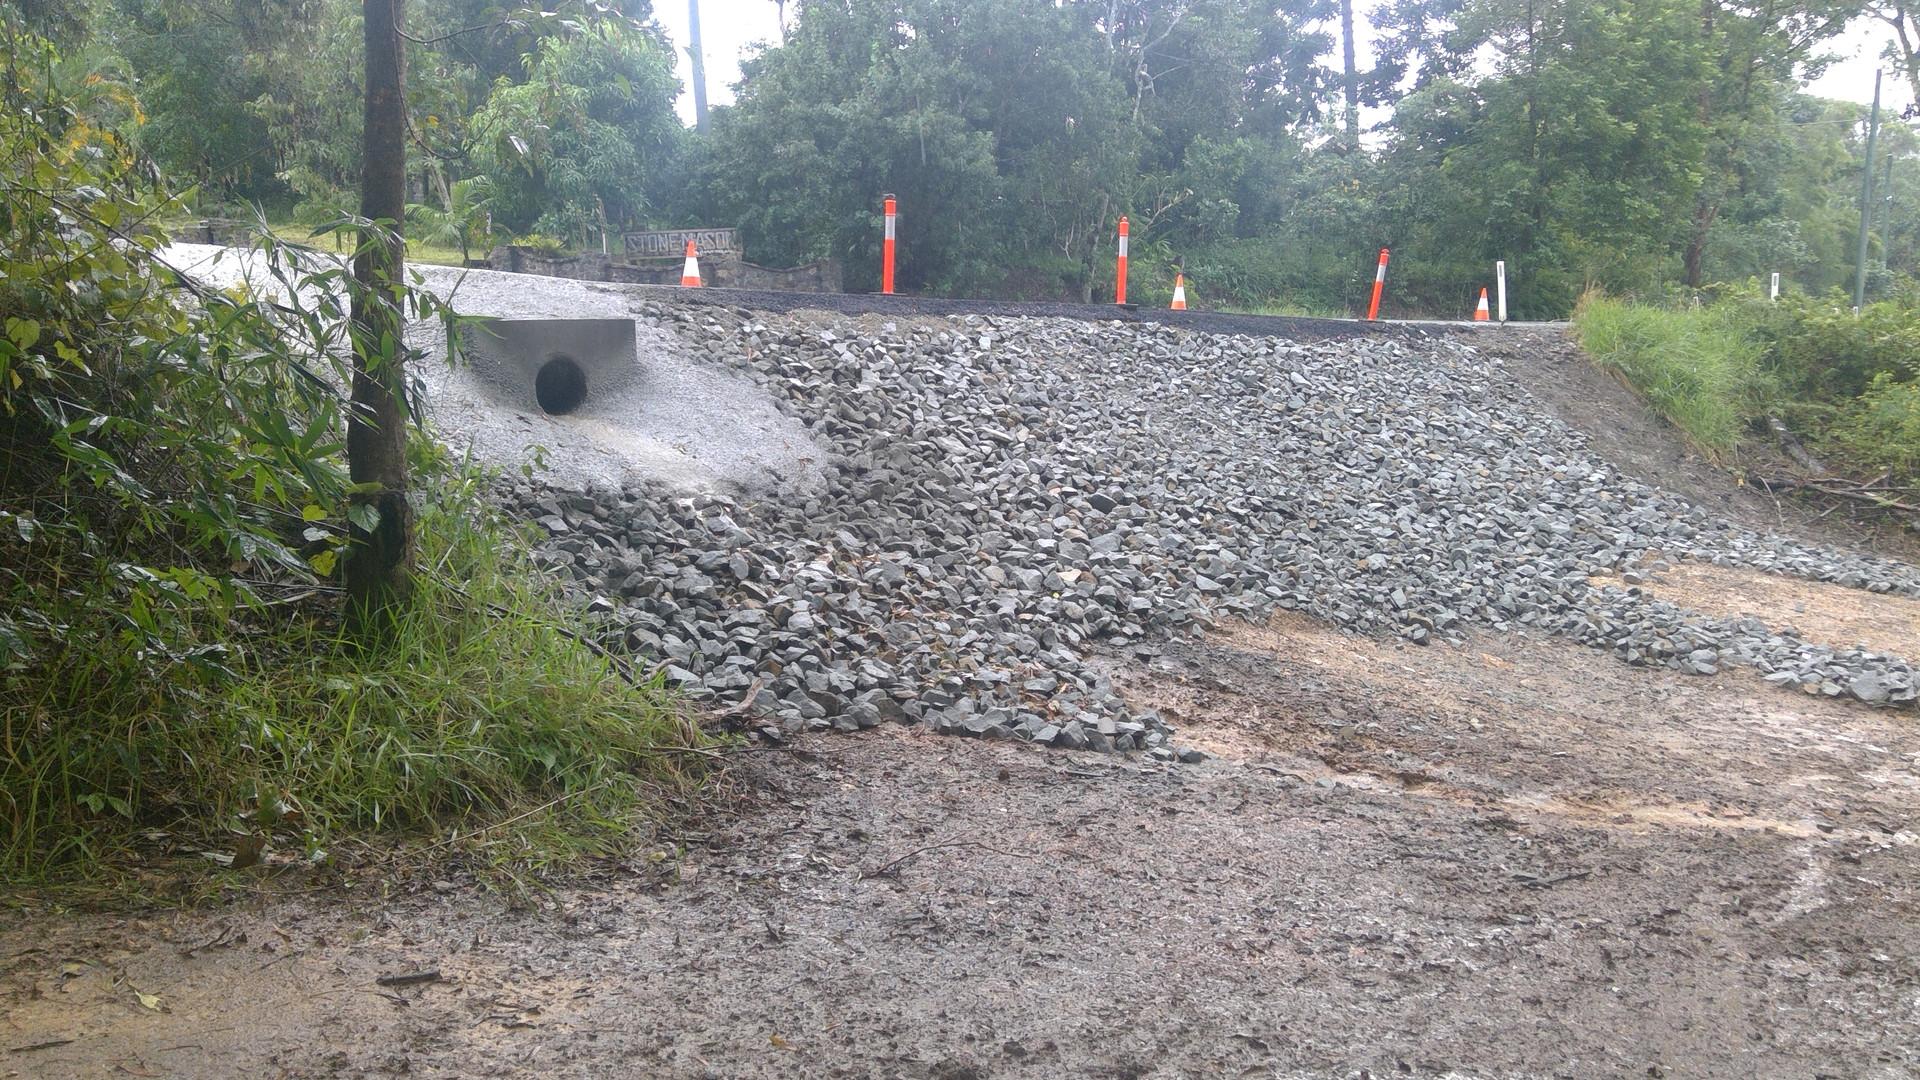 DTMR (Department of Transport & Main Roads) Slope Risk Assessments